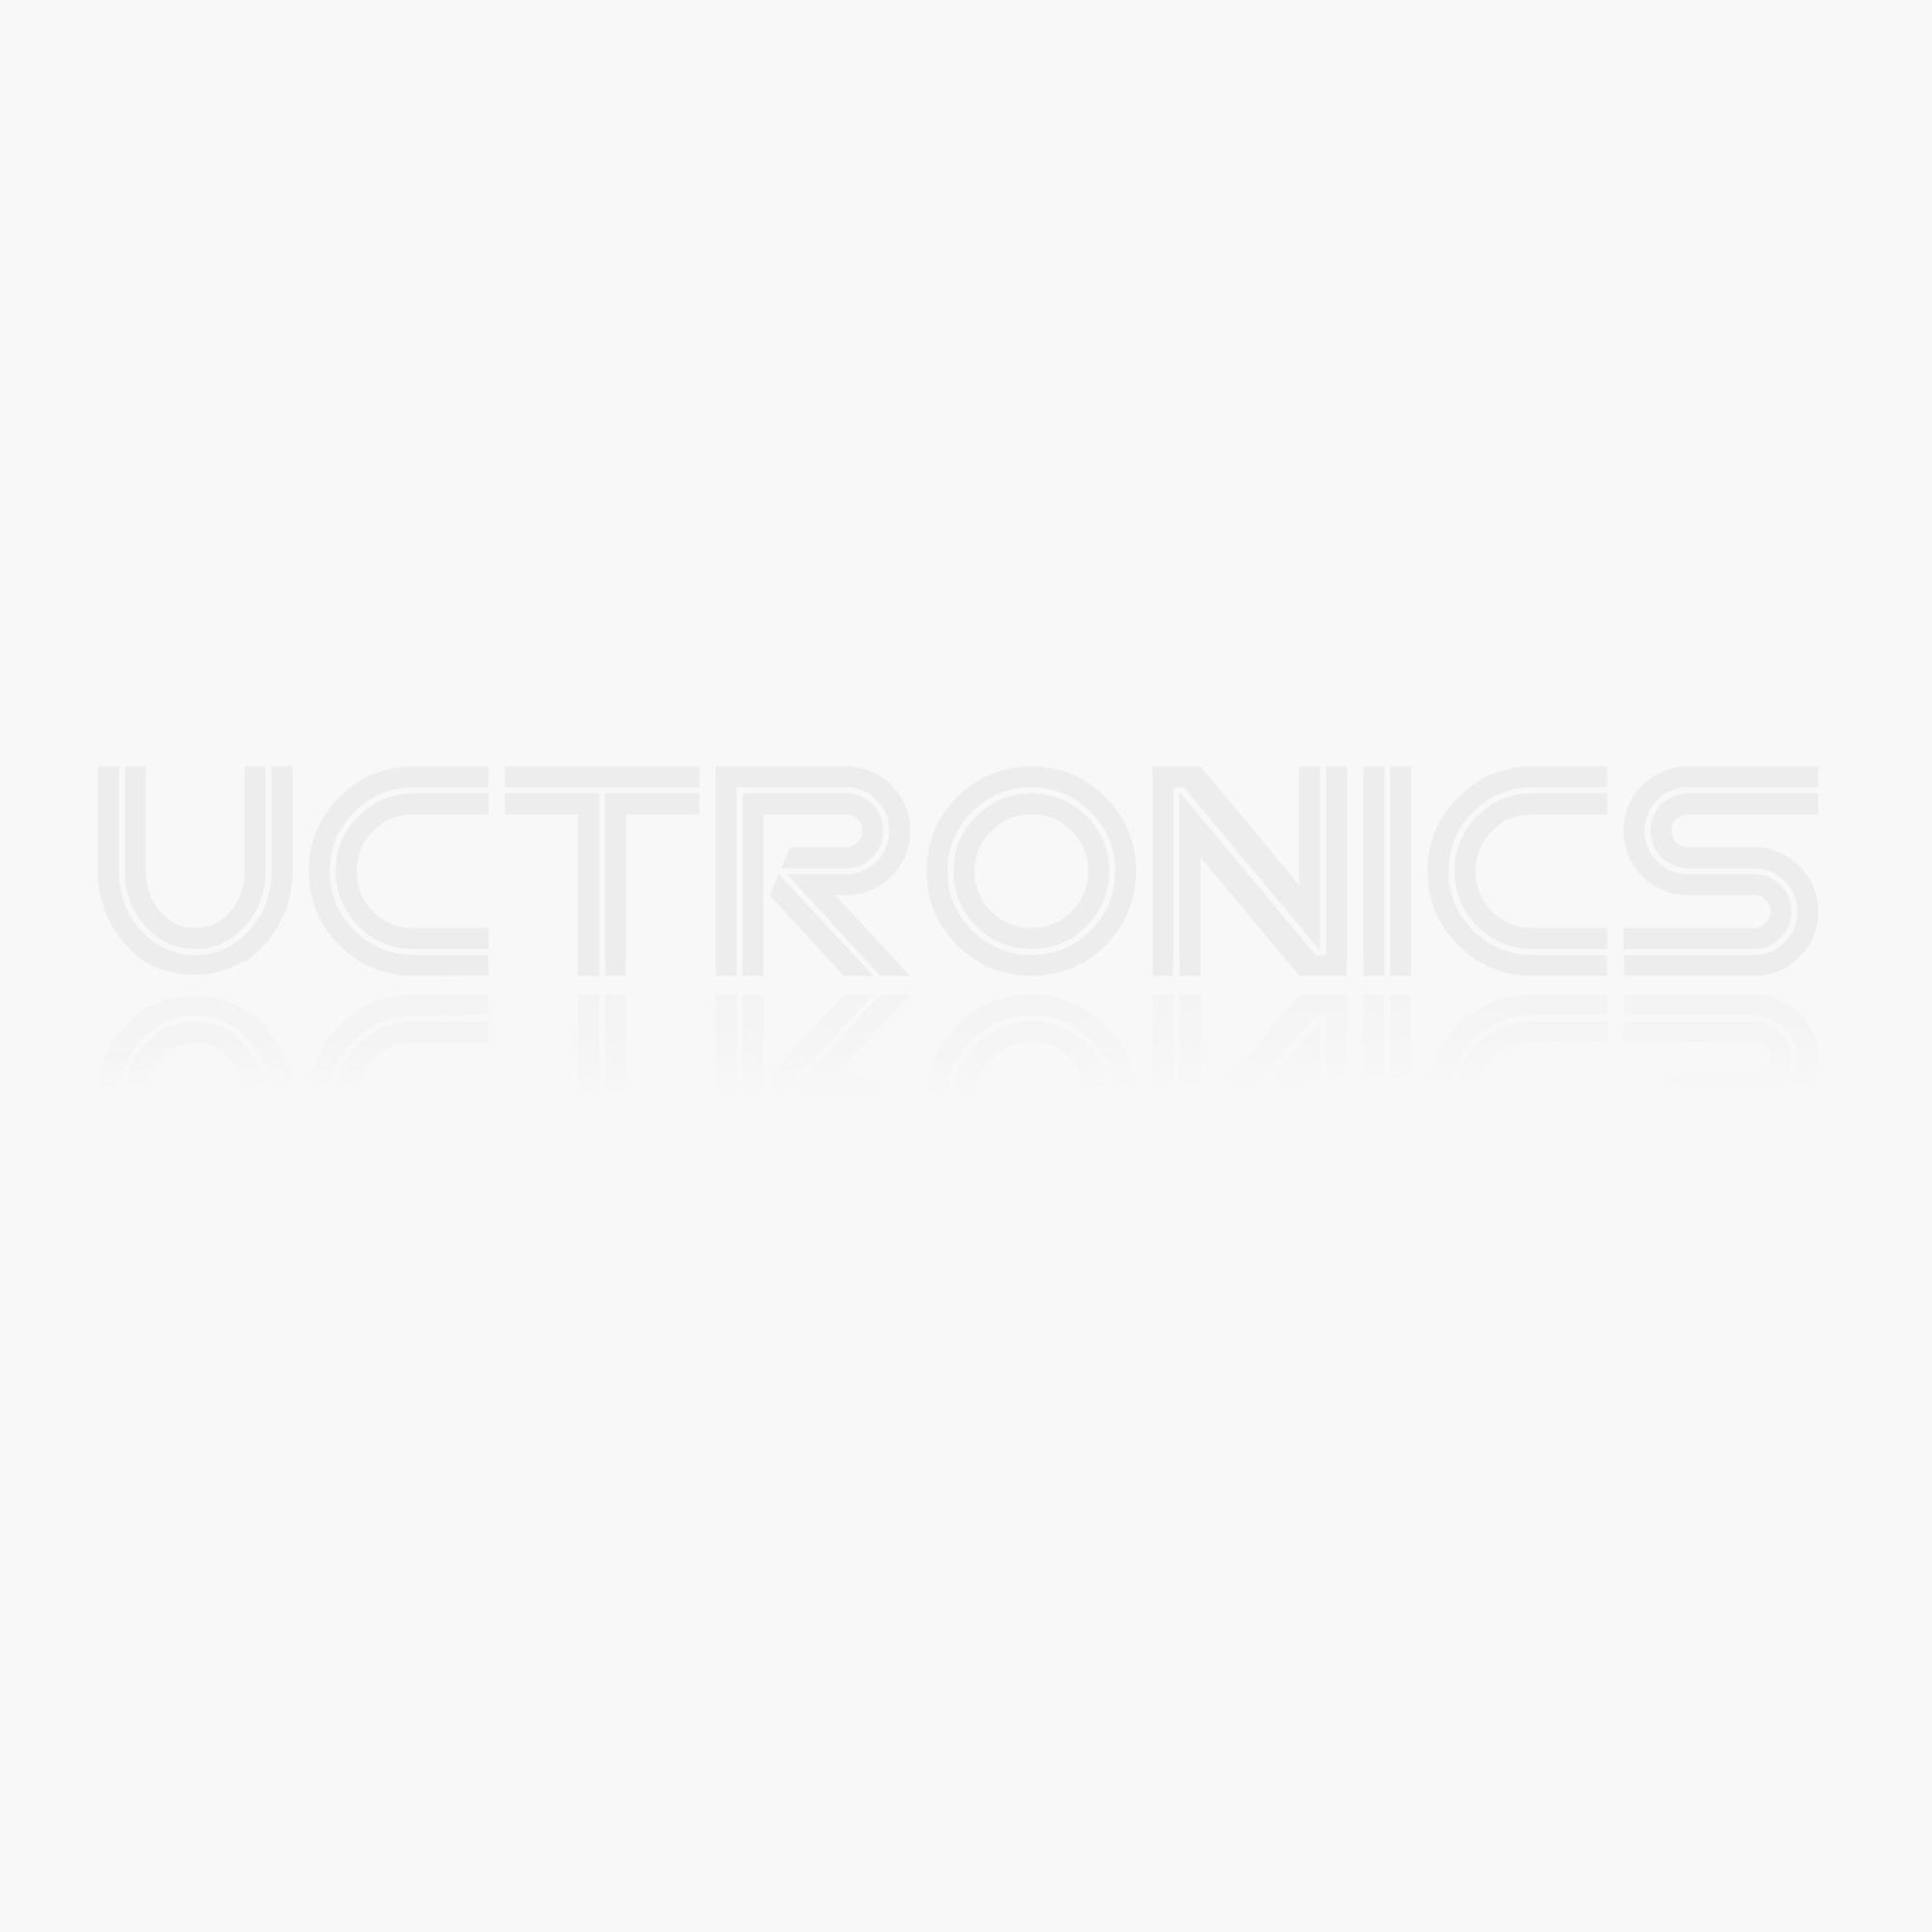 Mini DC 0-99.9v Digital Voltmeter Green